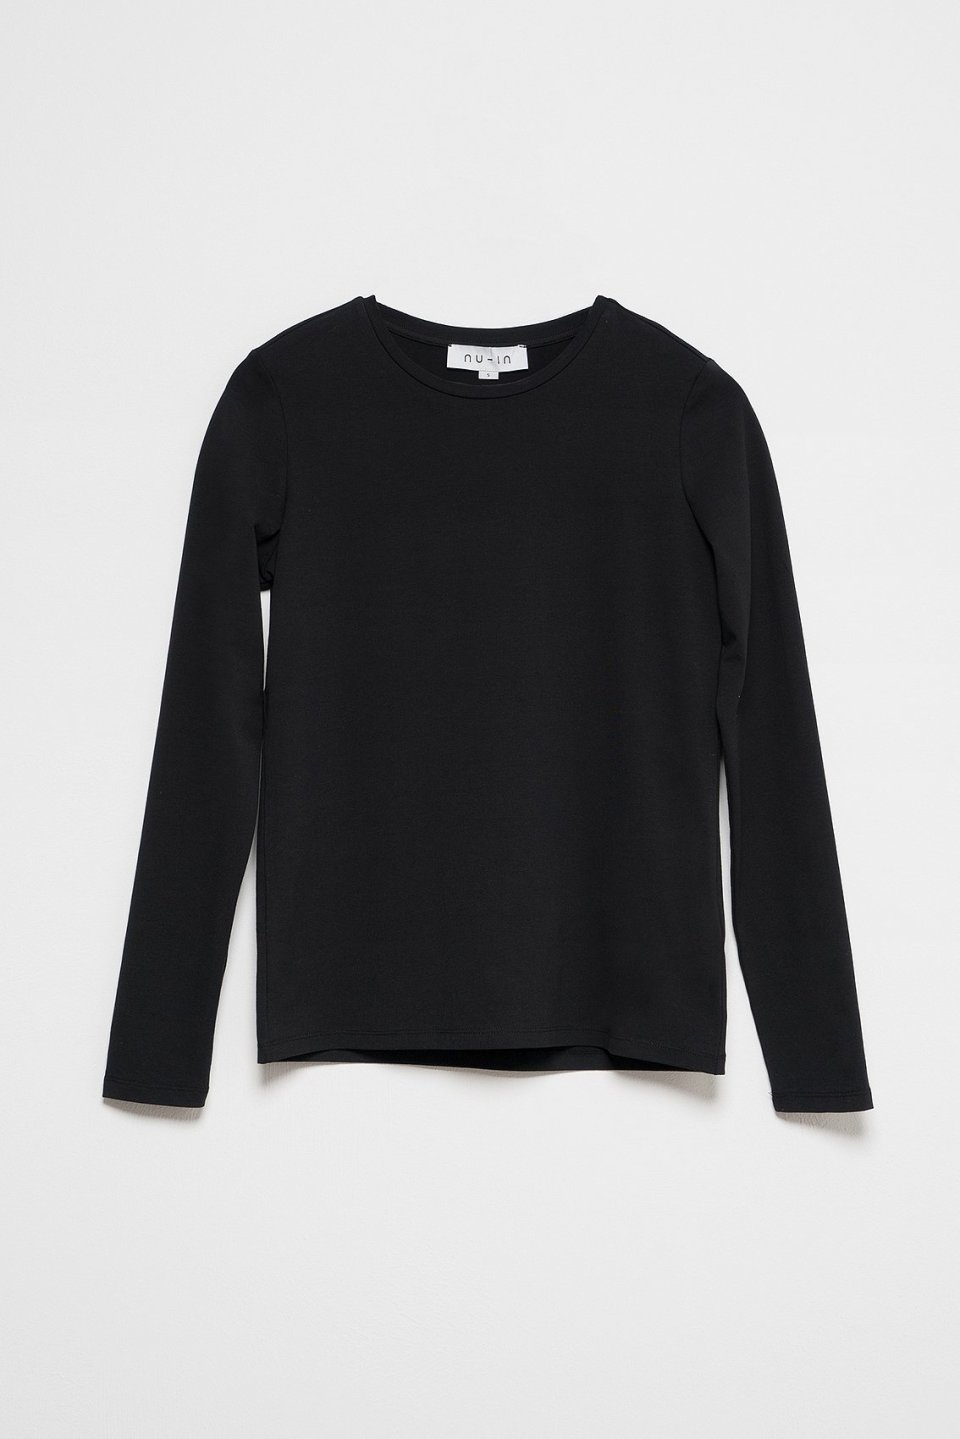 100% Organic Crew Neck Long Sleeve T-shirt